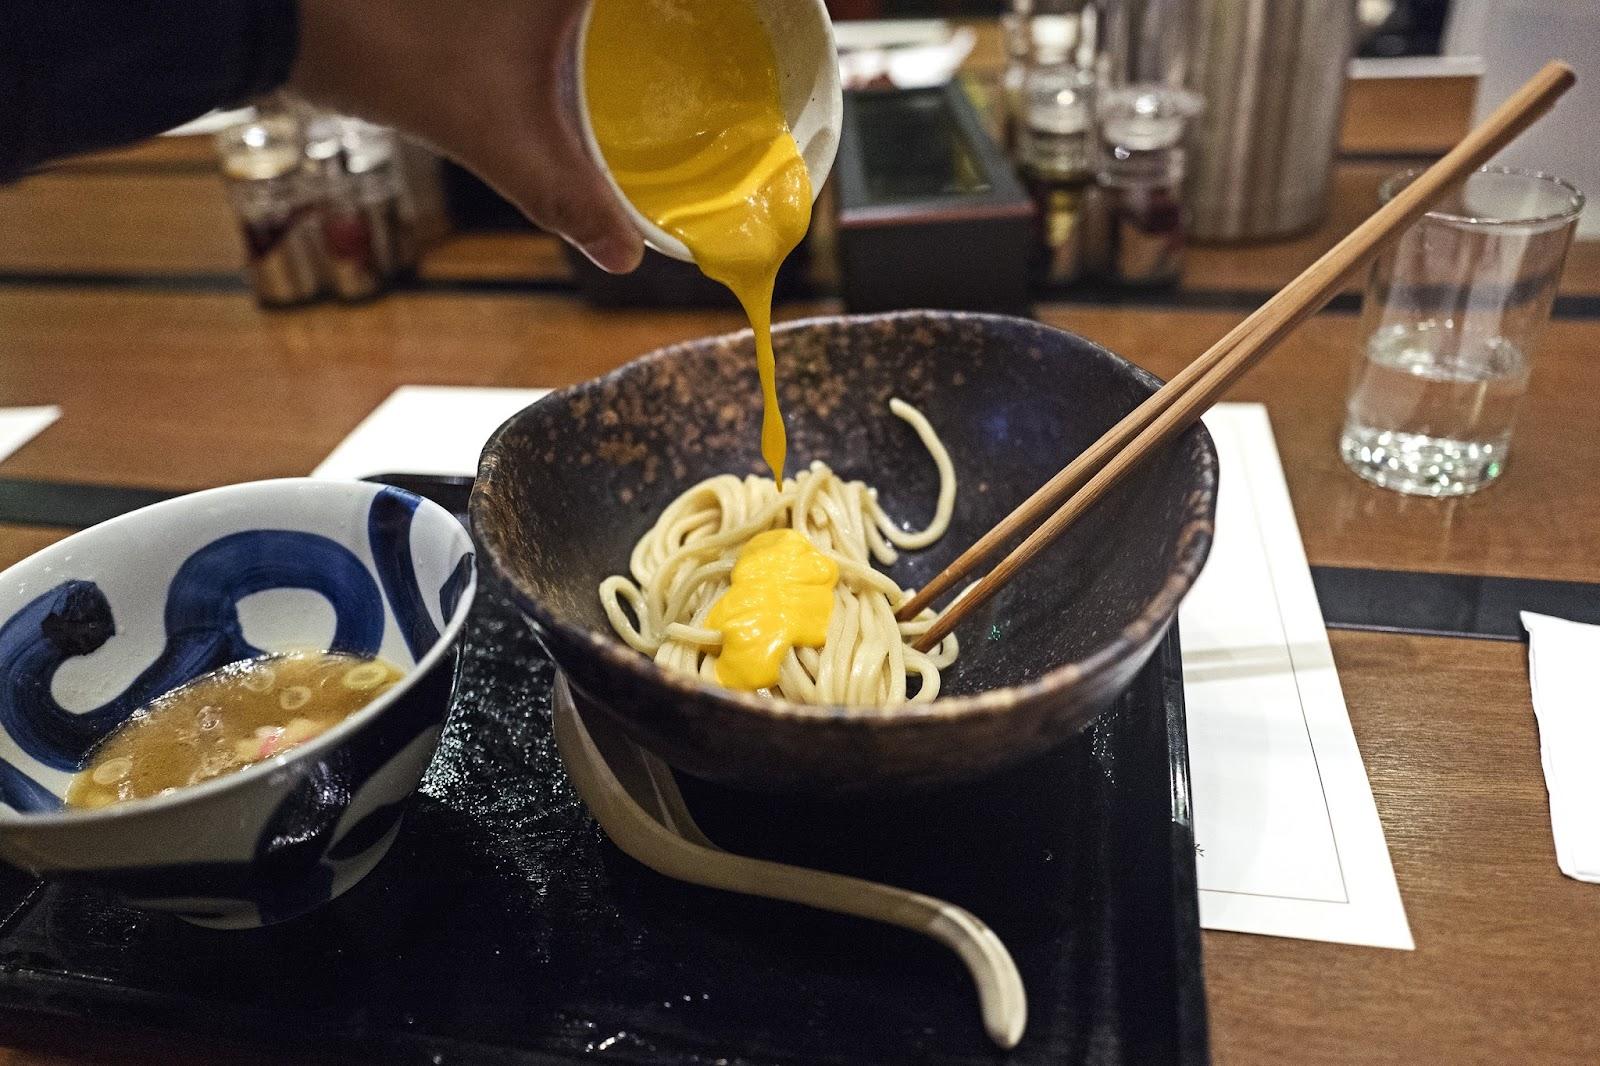 f-cheese-L1050853.jpg